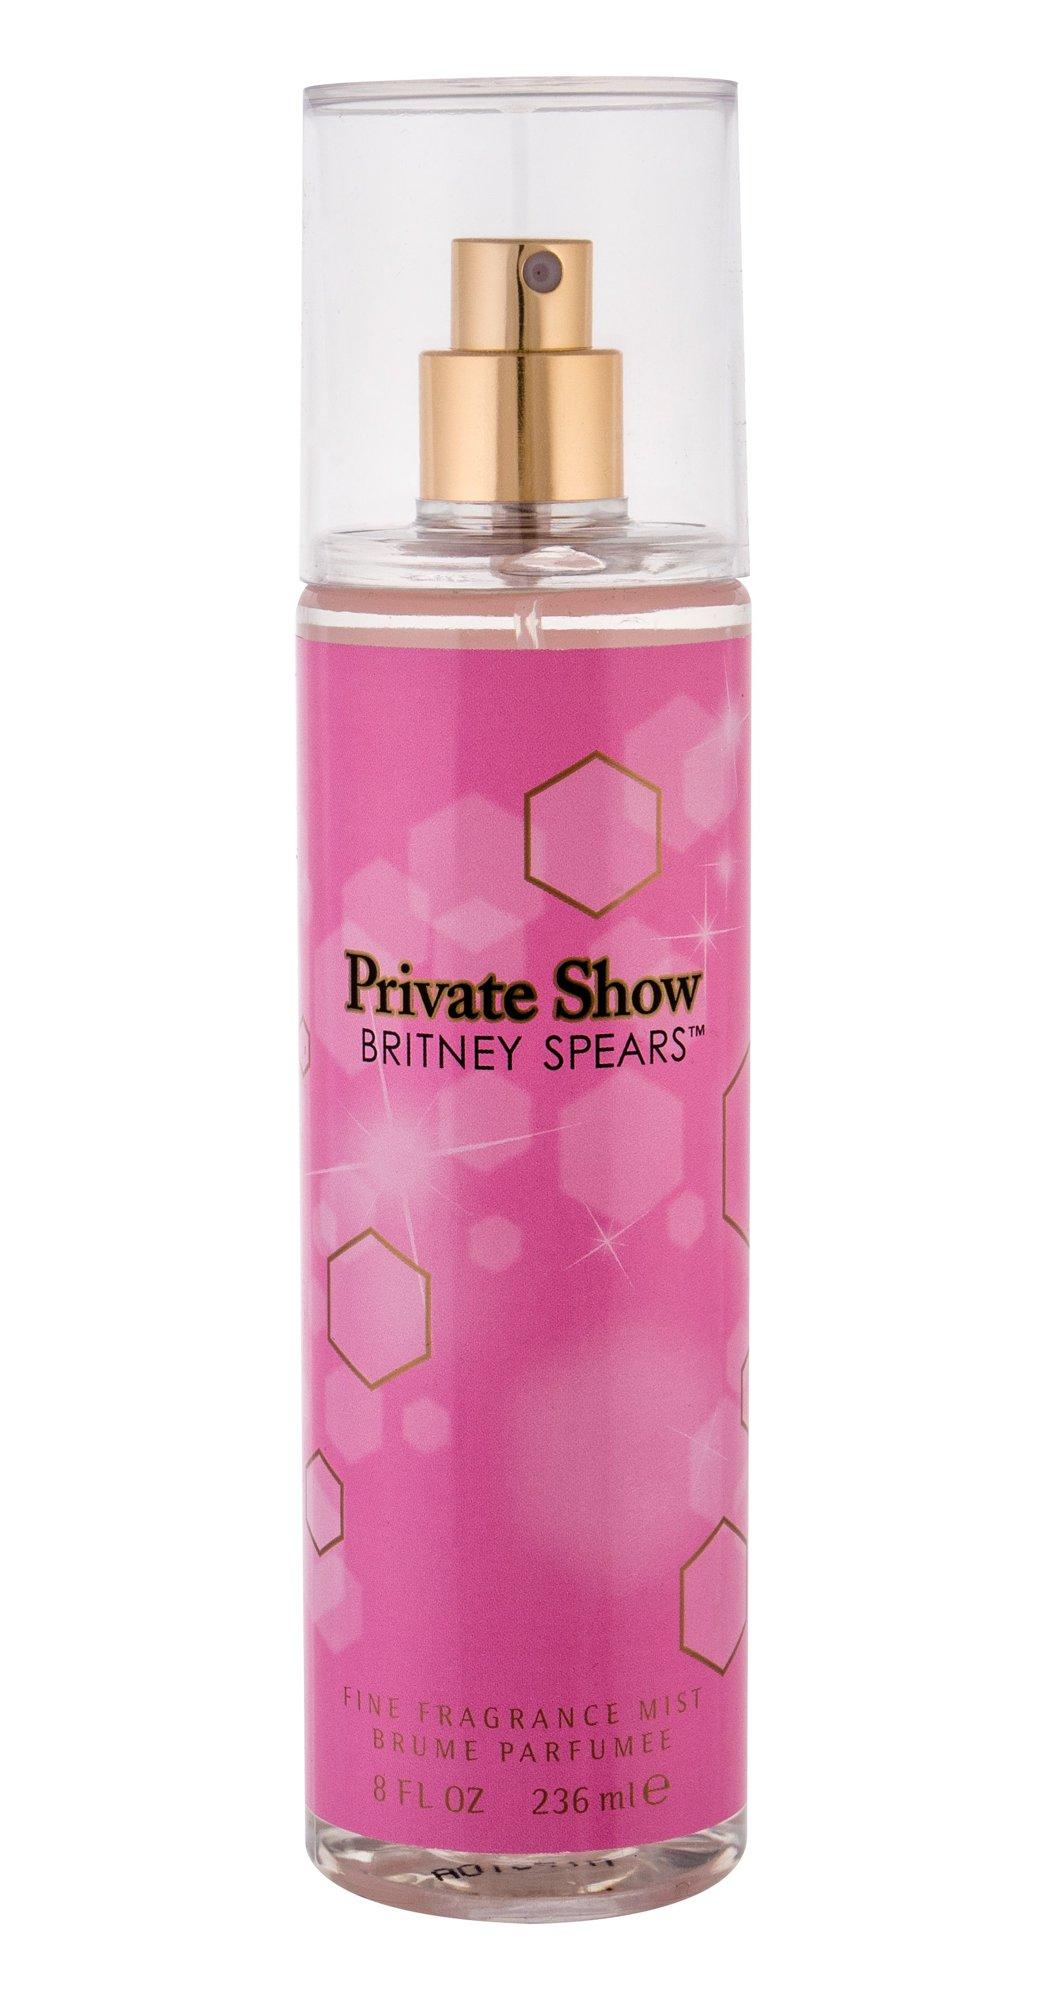 Britney Spears Private Show Body Veil 236ml